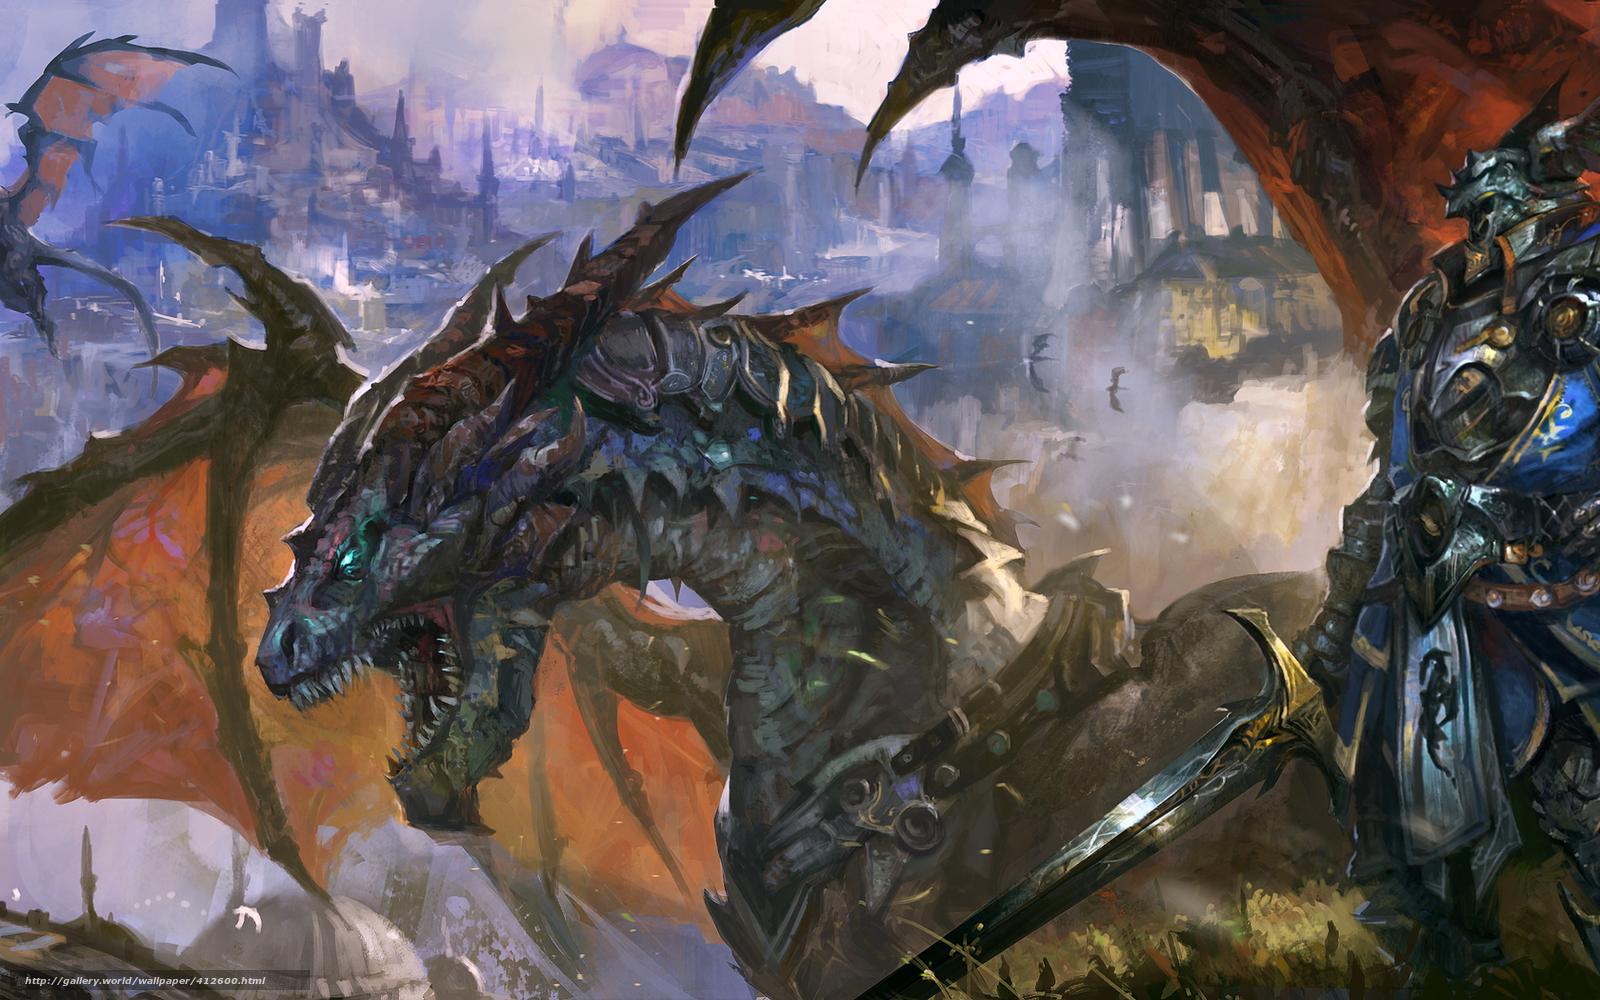 Download wallpaper Warrior, knight, dragon, armor free desktop ...: gde-fon.com/download/Warrior_knight_dragon_armor_sword_city/412600...